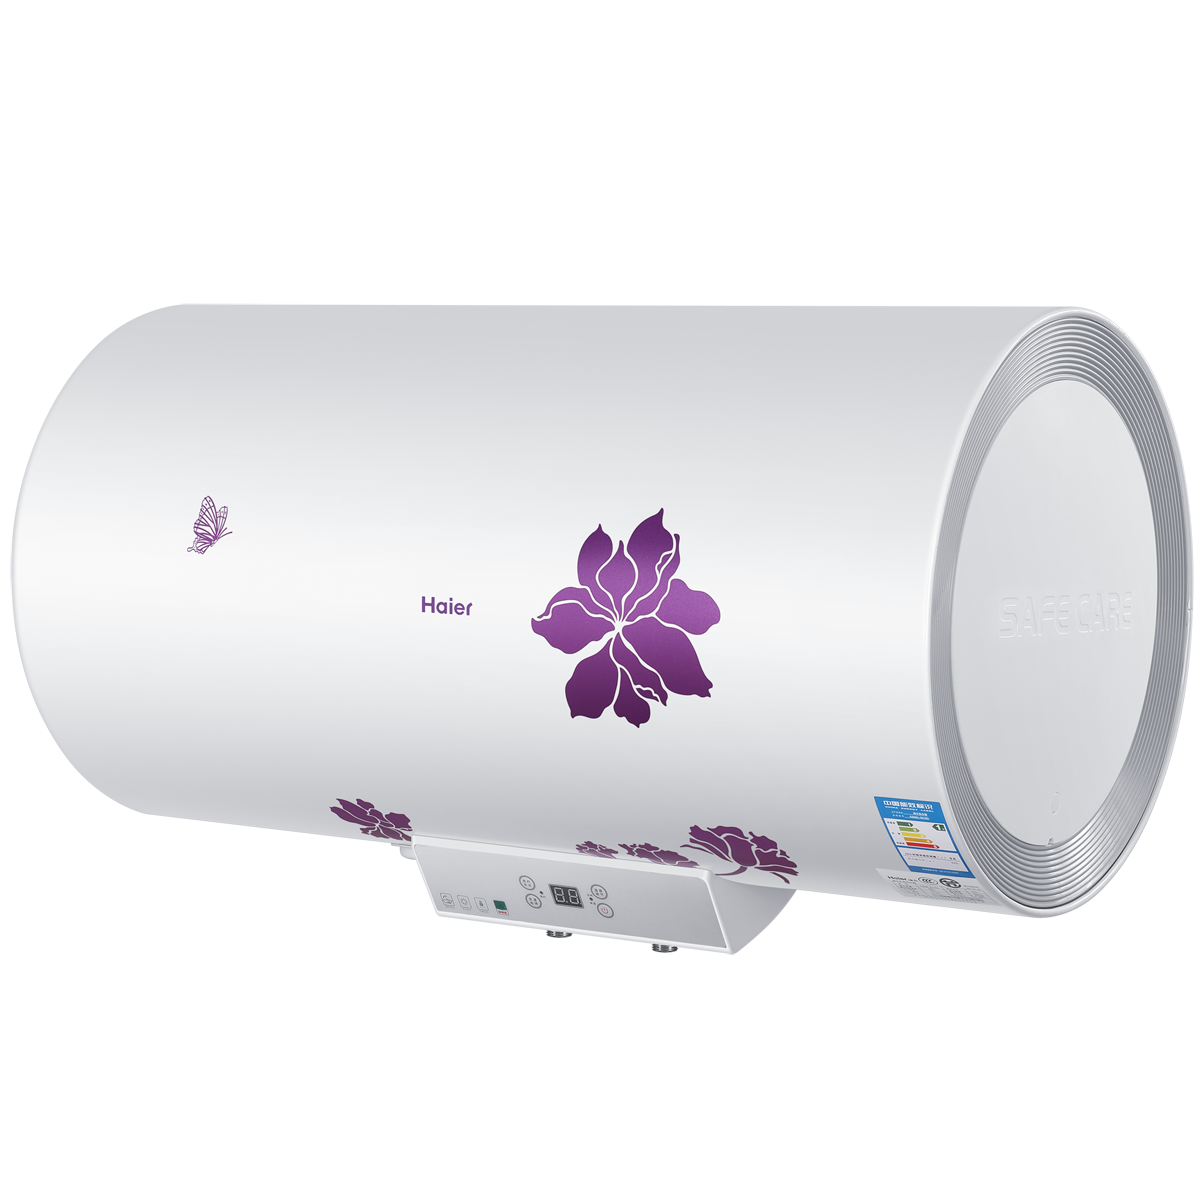 海尔电热水器 es60h-d2(ze)